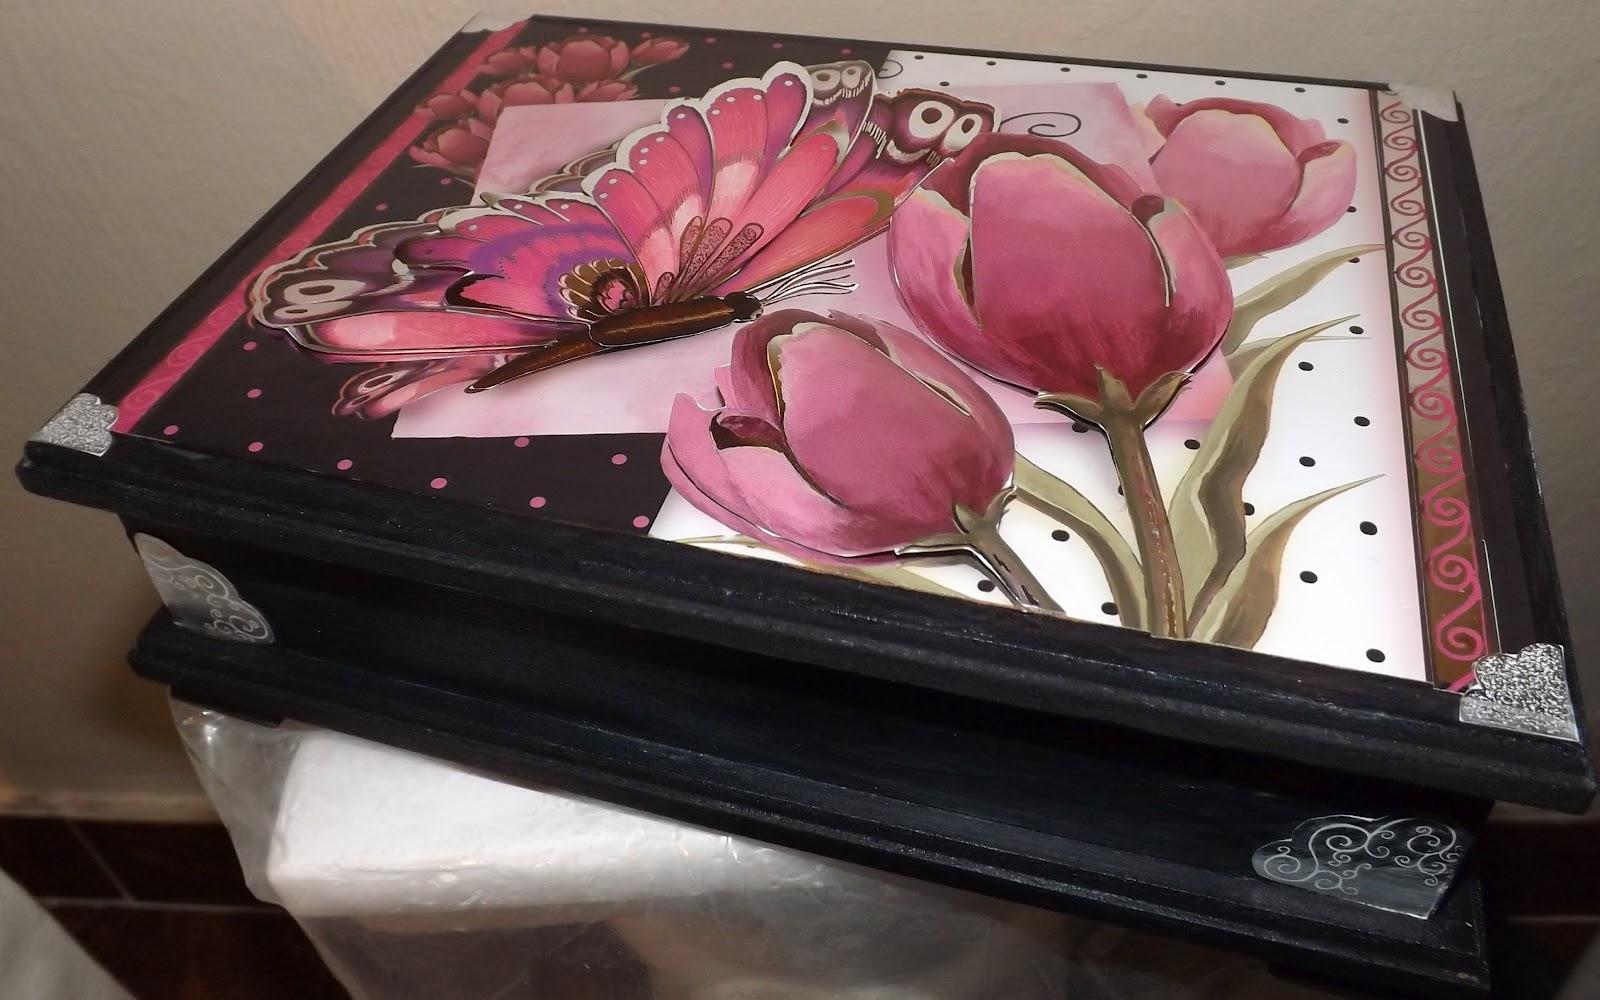 Pintura Decorativa Efeito 3d Of Taller De Pintura Decorativa Caja Con Decoupage 3d